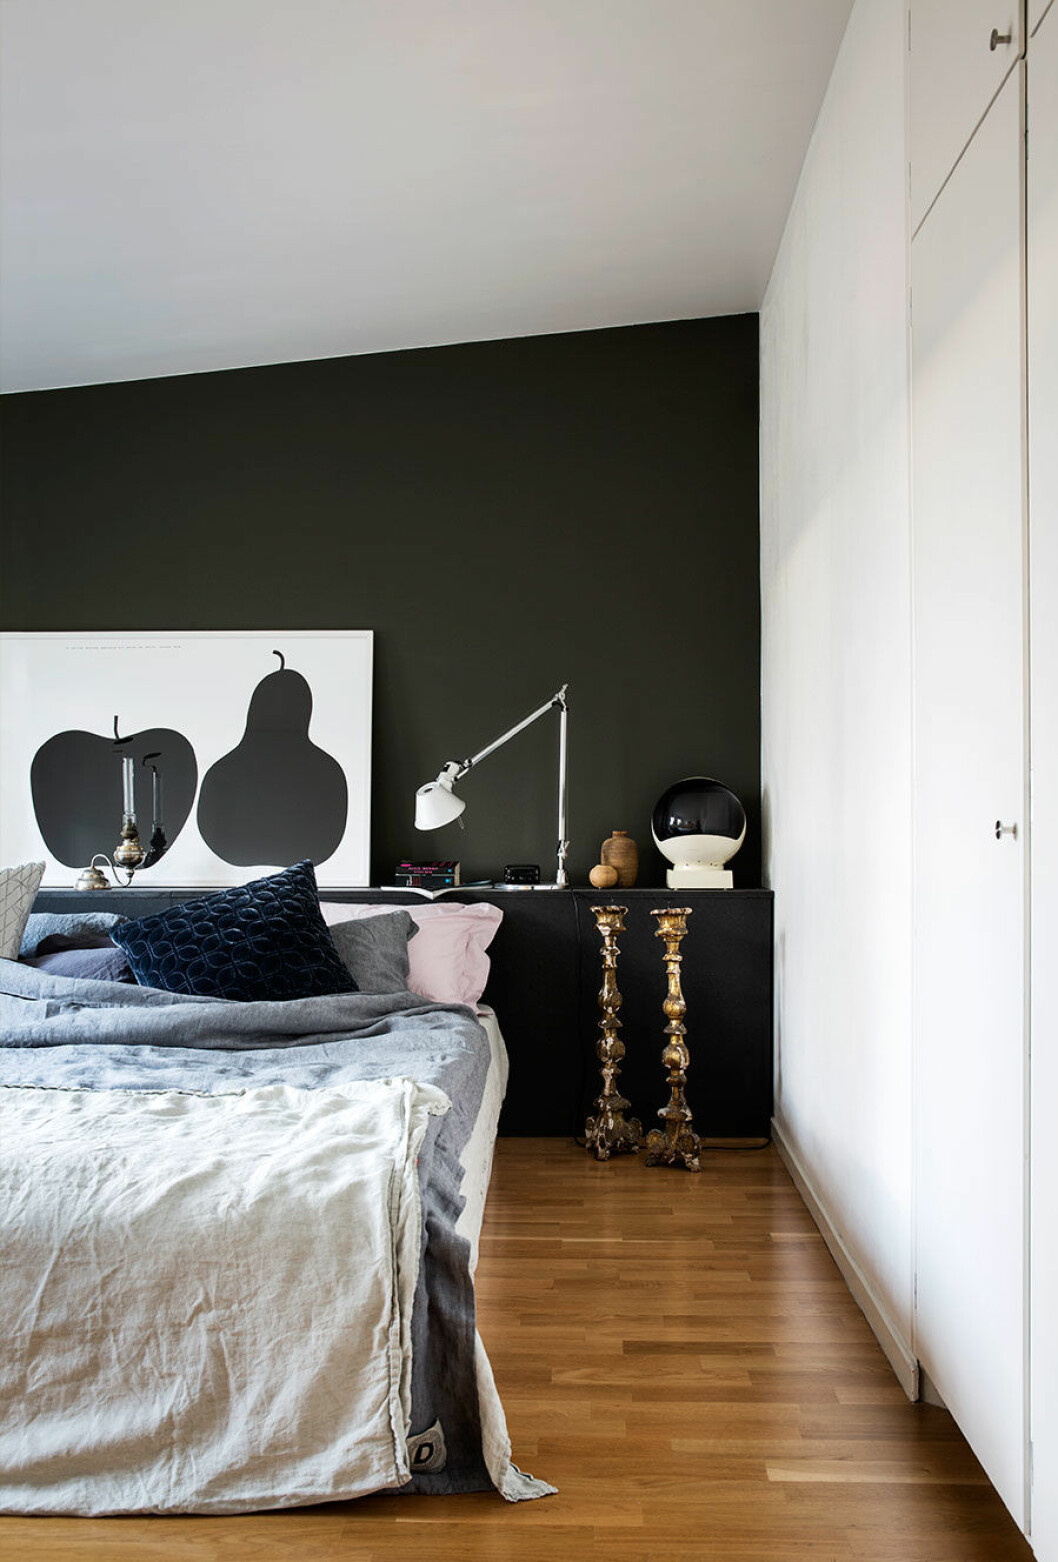 sovrum_bedroom_retro_60_tal_Foto_Johan_Sellen